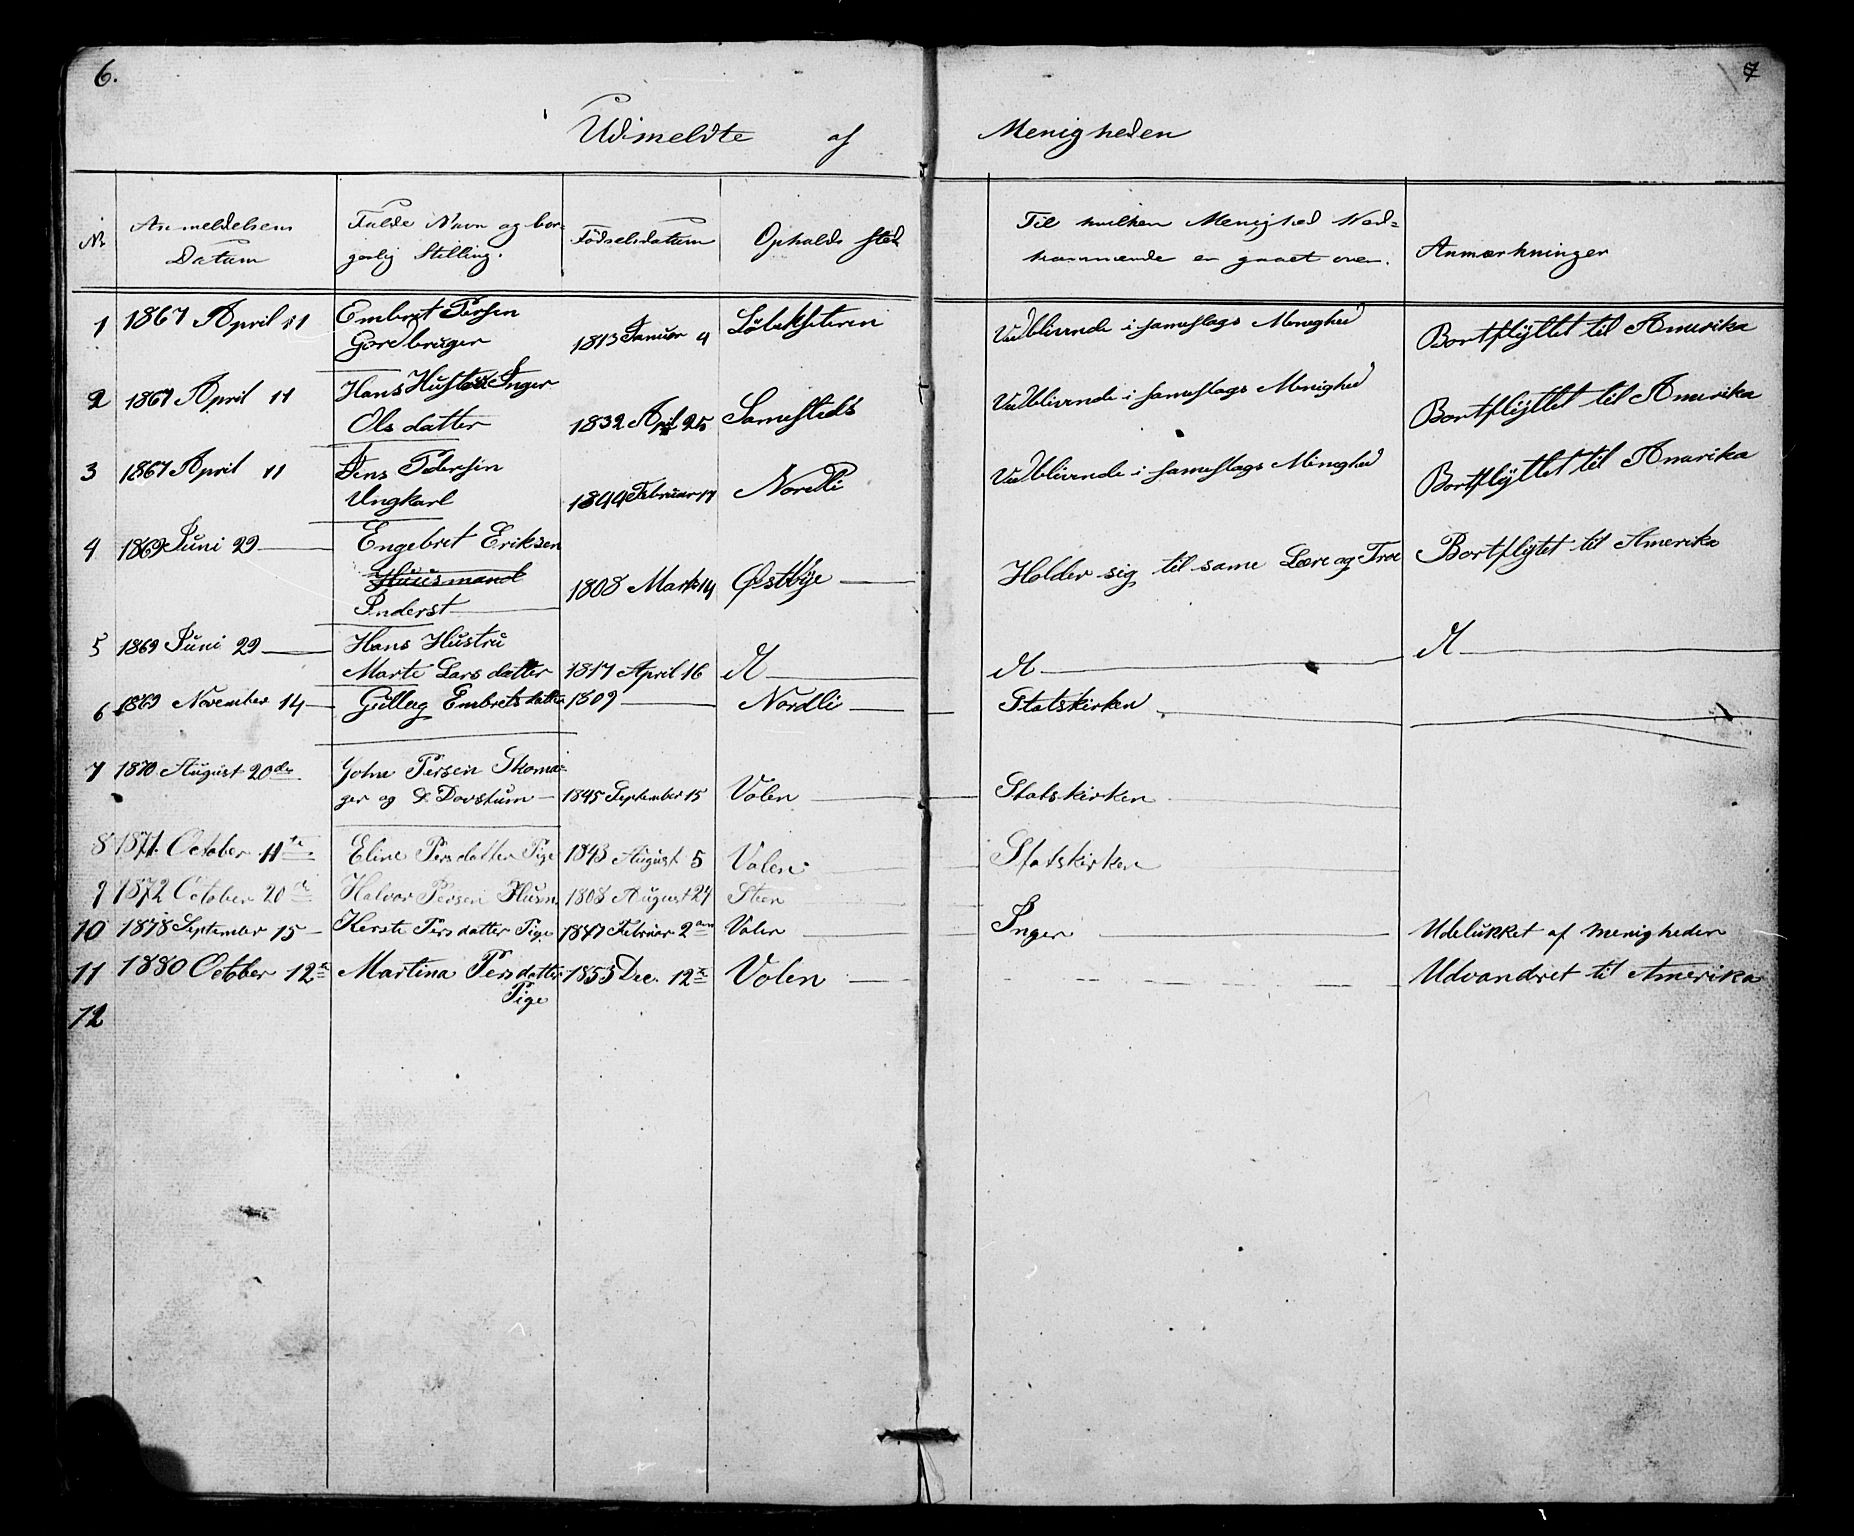 SAH, Misjonsforbundet, 01/L0001: Dissenterprotokoll nr. 1, 1858-1881, s. 6